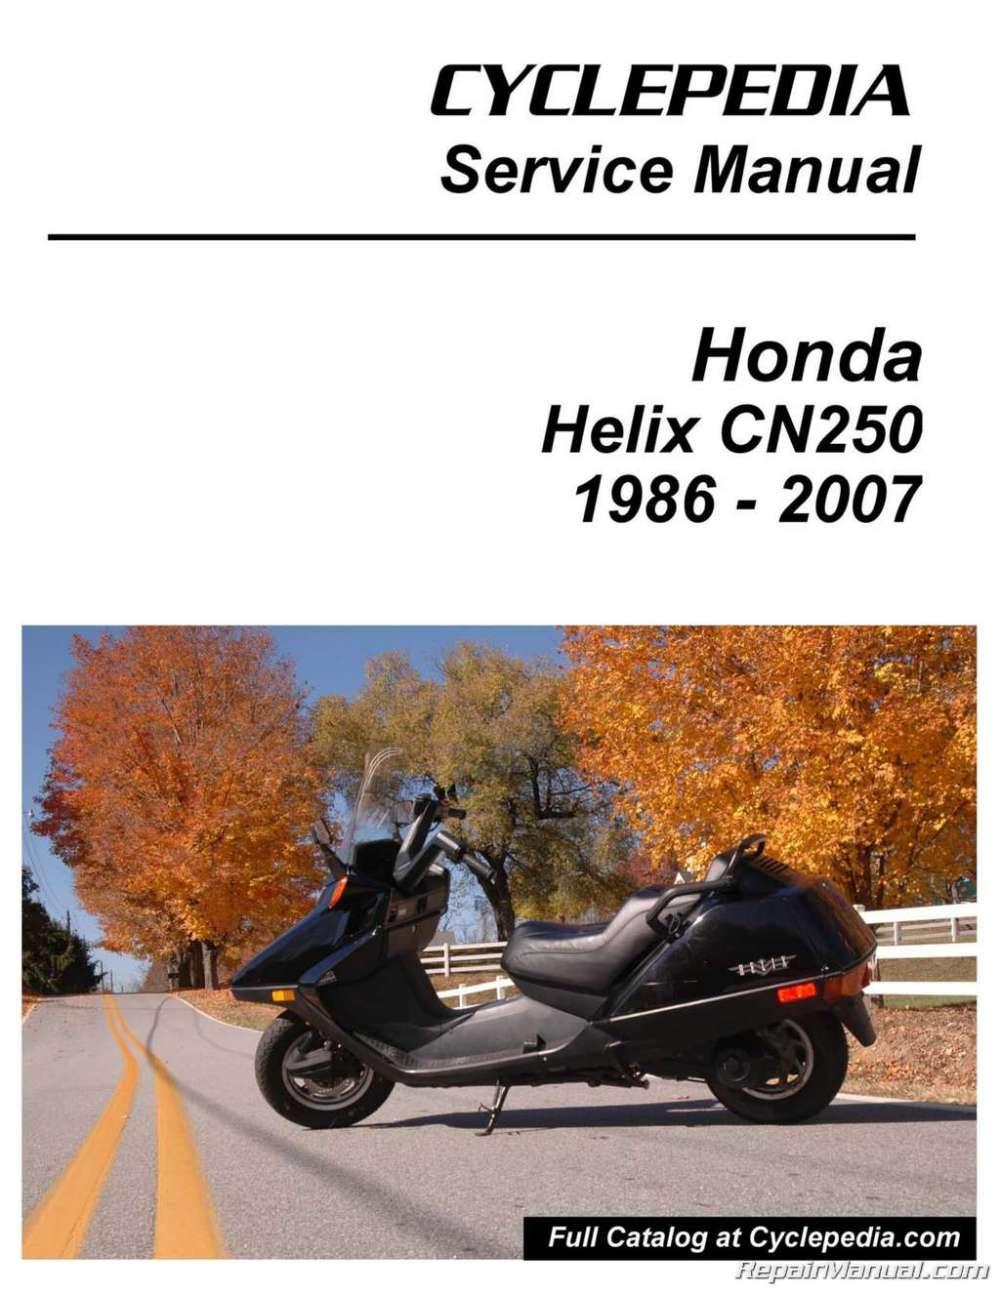 medium resolution of cyclepedia honda helix manual